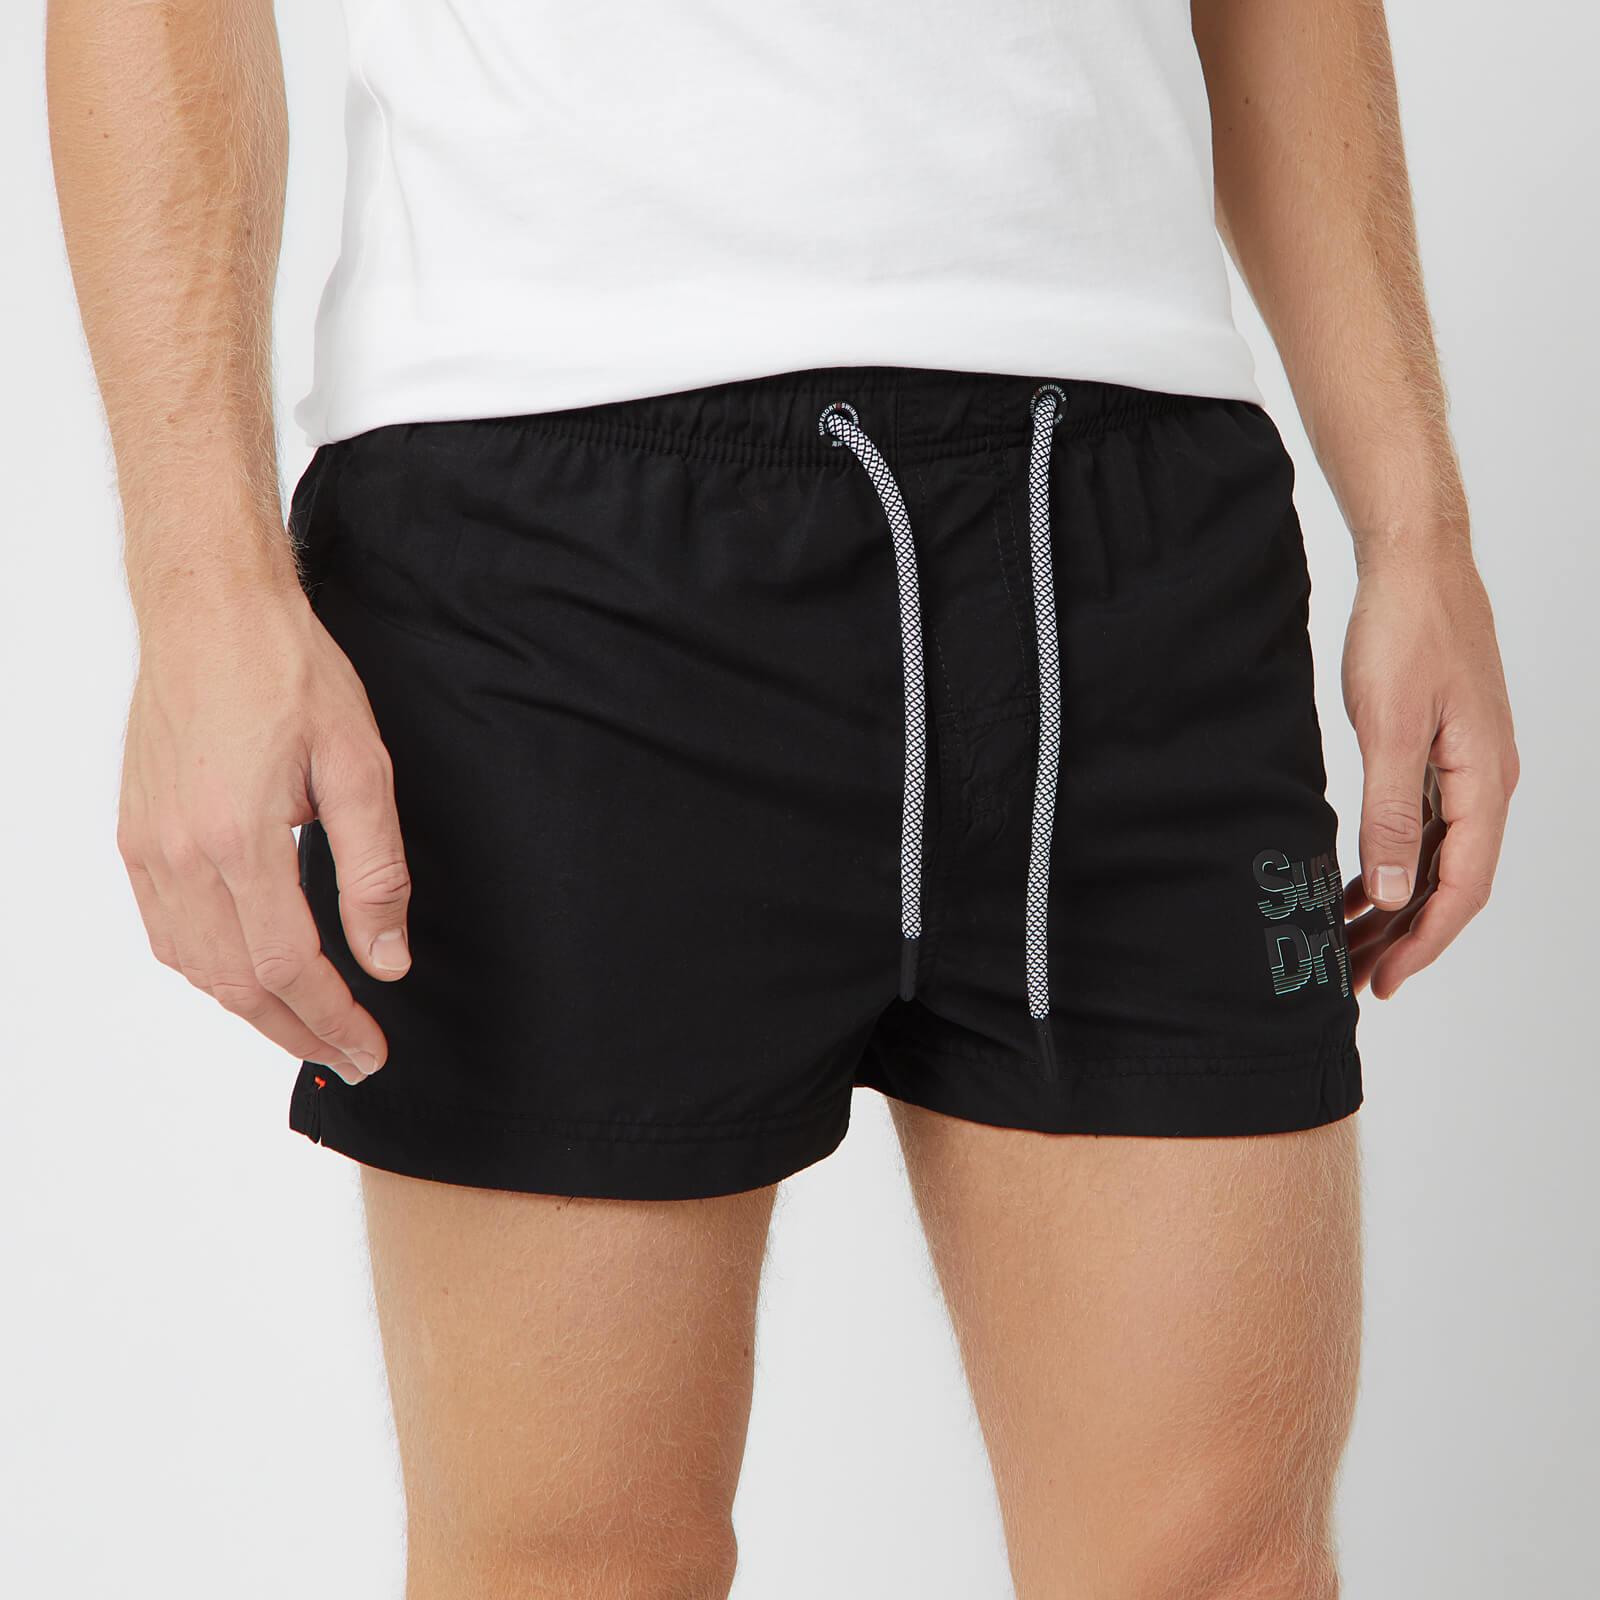 Superdry Men's Sorrento Pastel Swim Shorts - Black - S